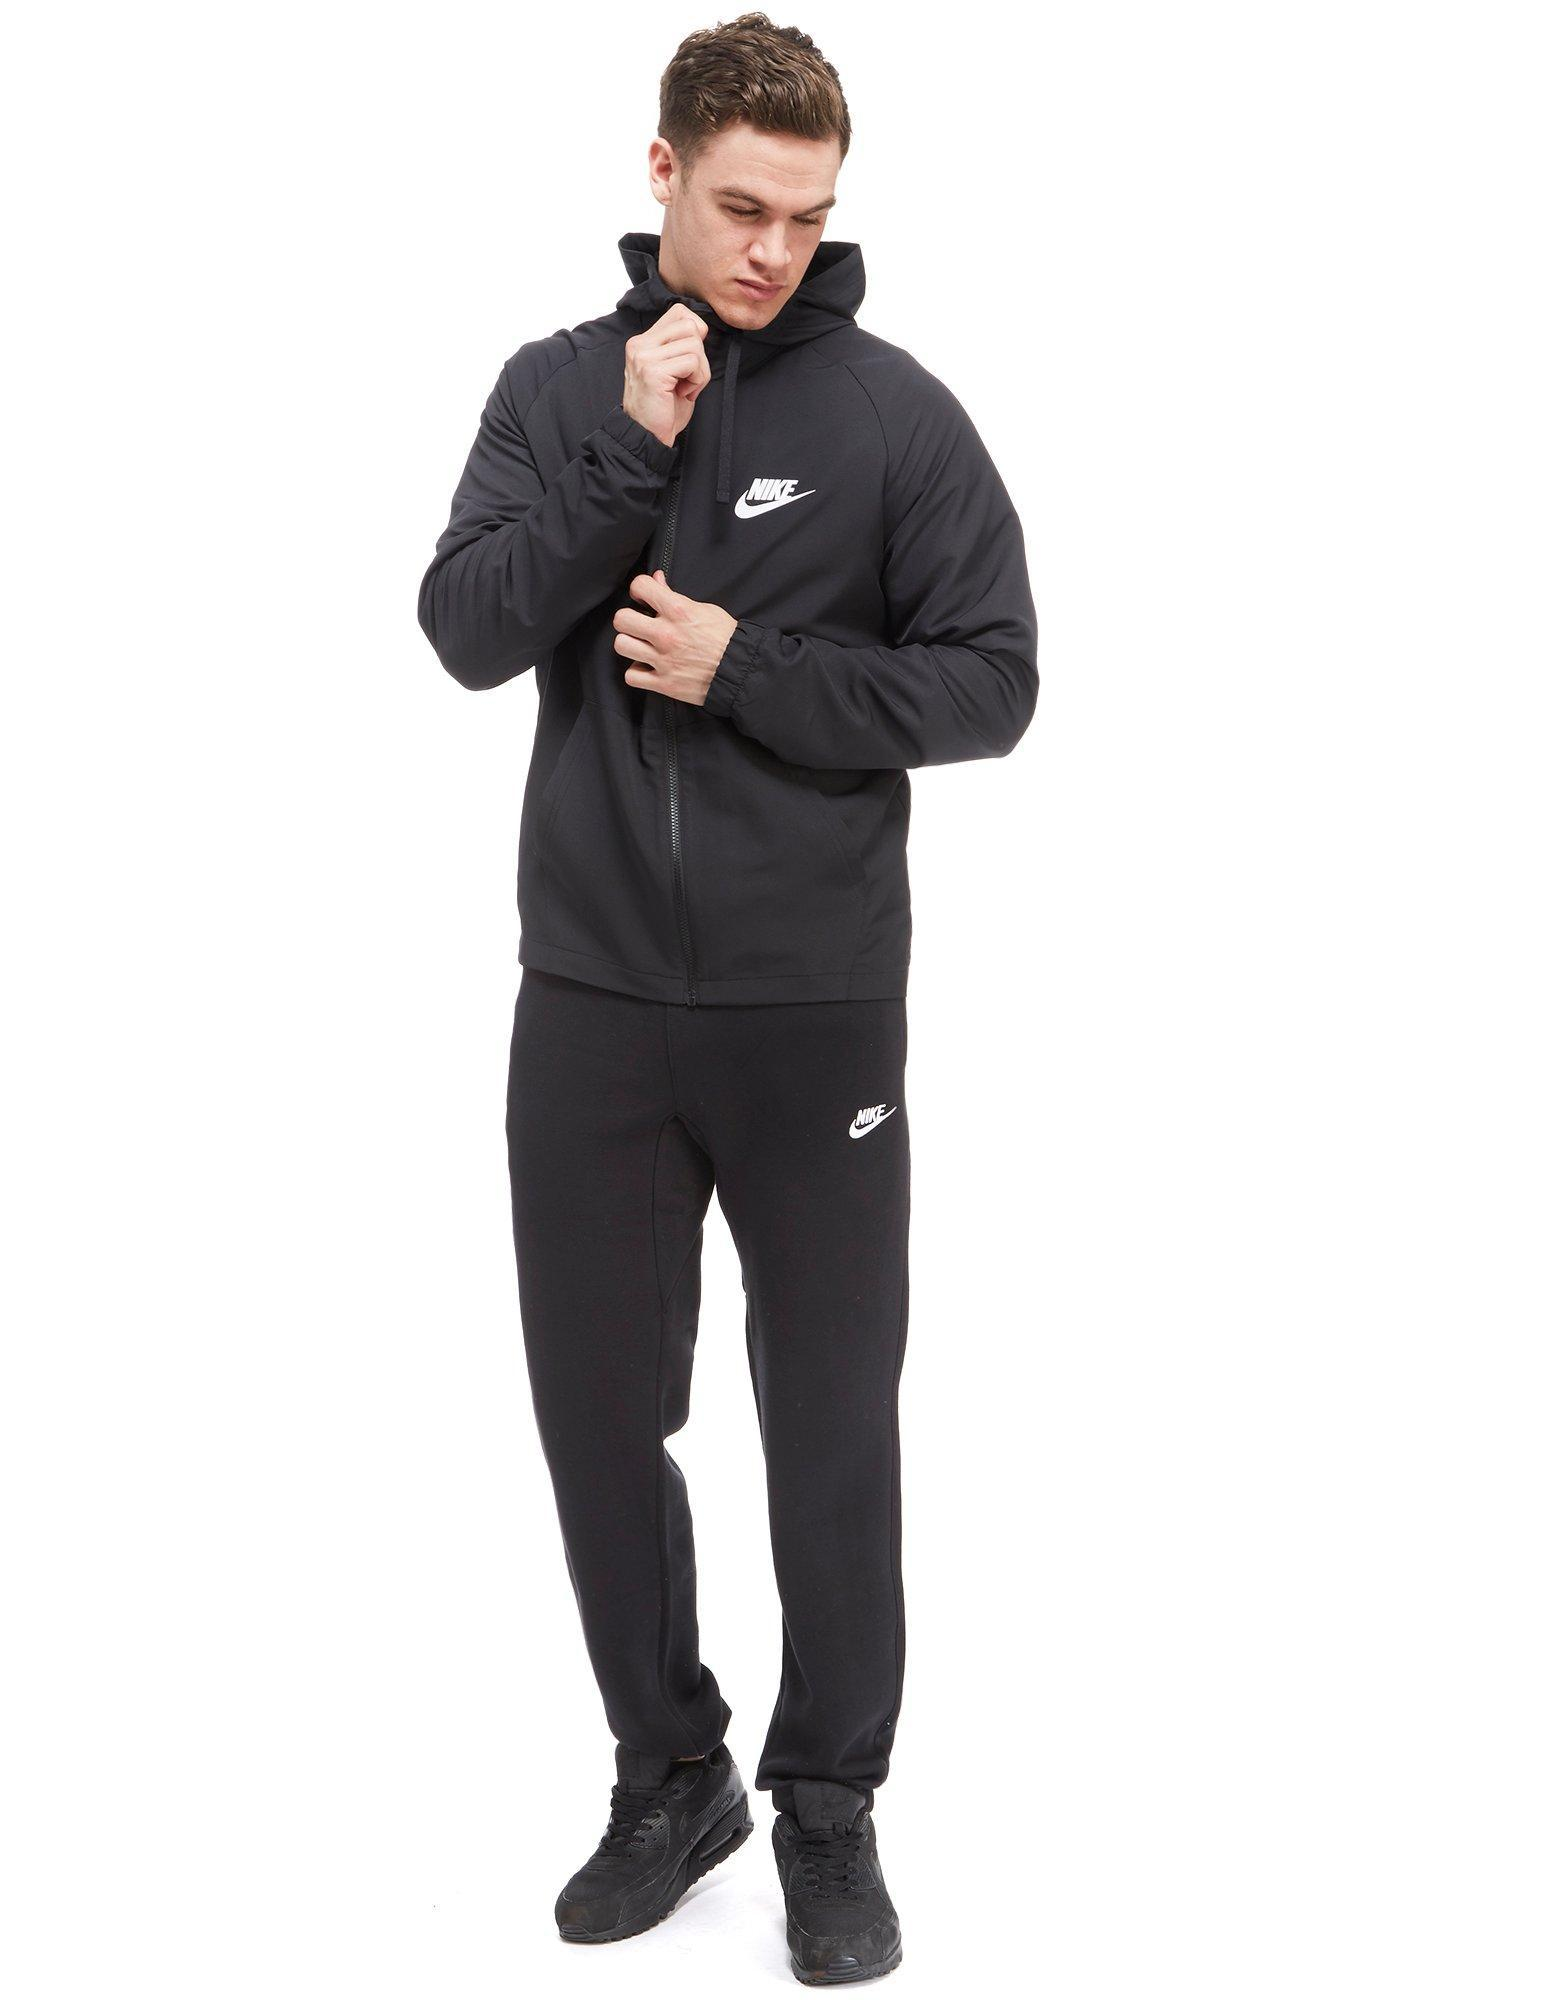 Nike - Black Shut Out 2 Woven Hoody for Men - Lyst. View Fullscreen